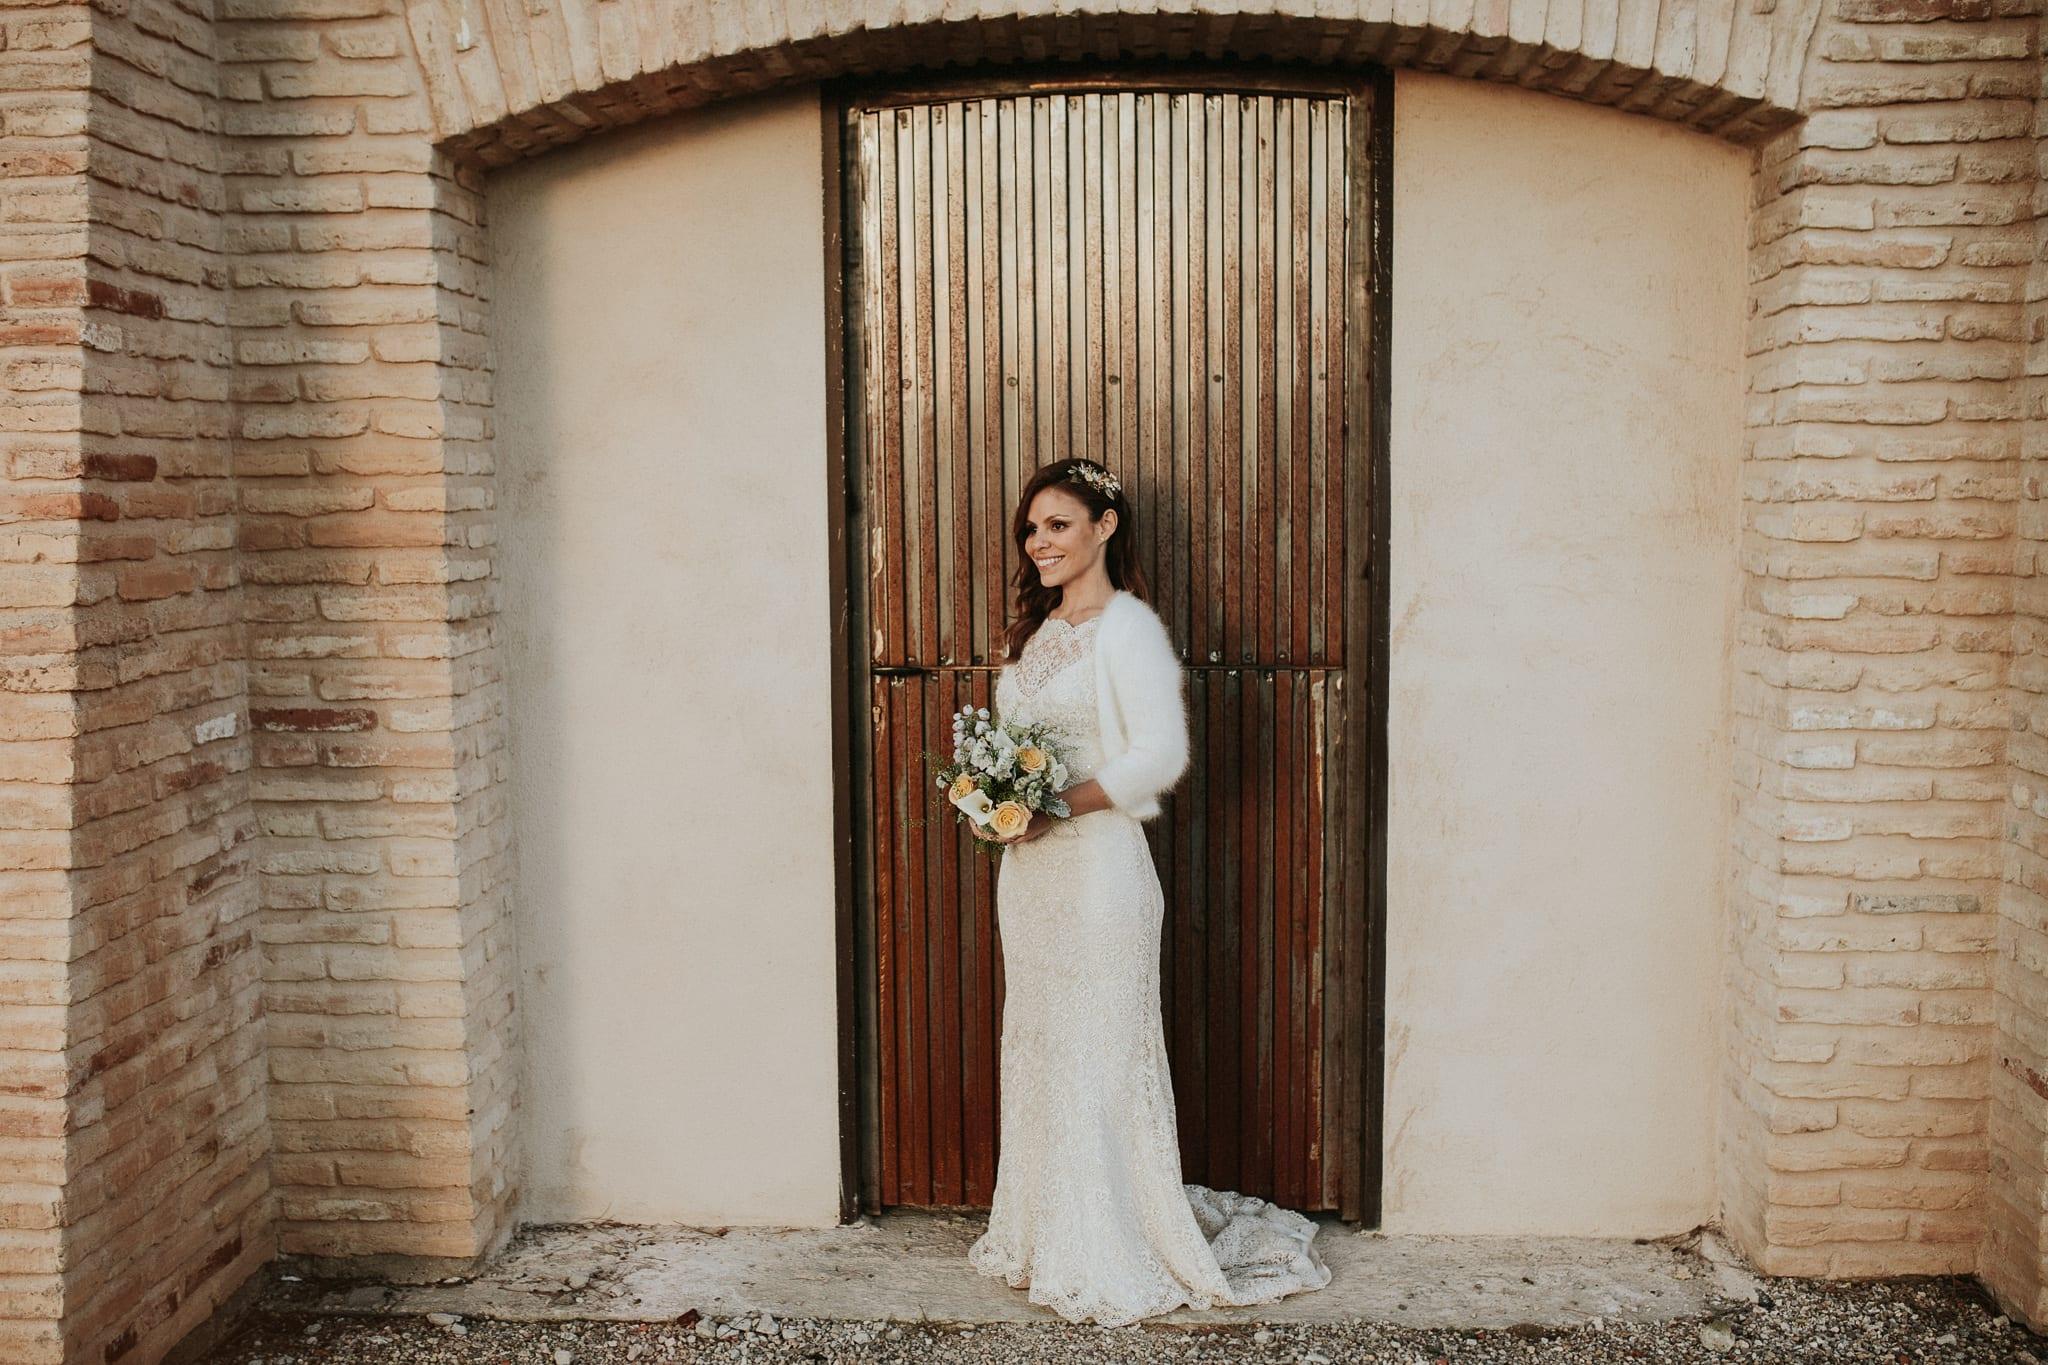 Fotografo-bodas-Cigarral-de-las-Mercedes-121